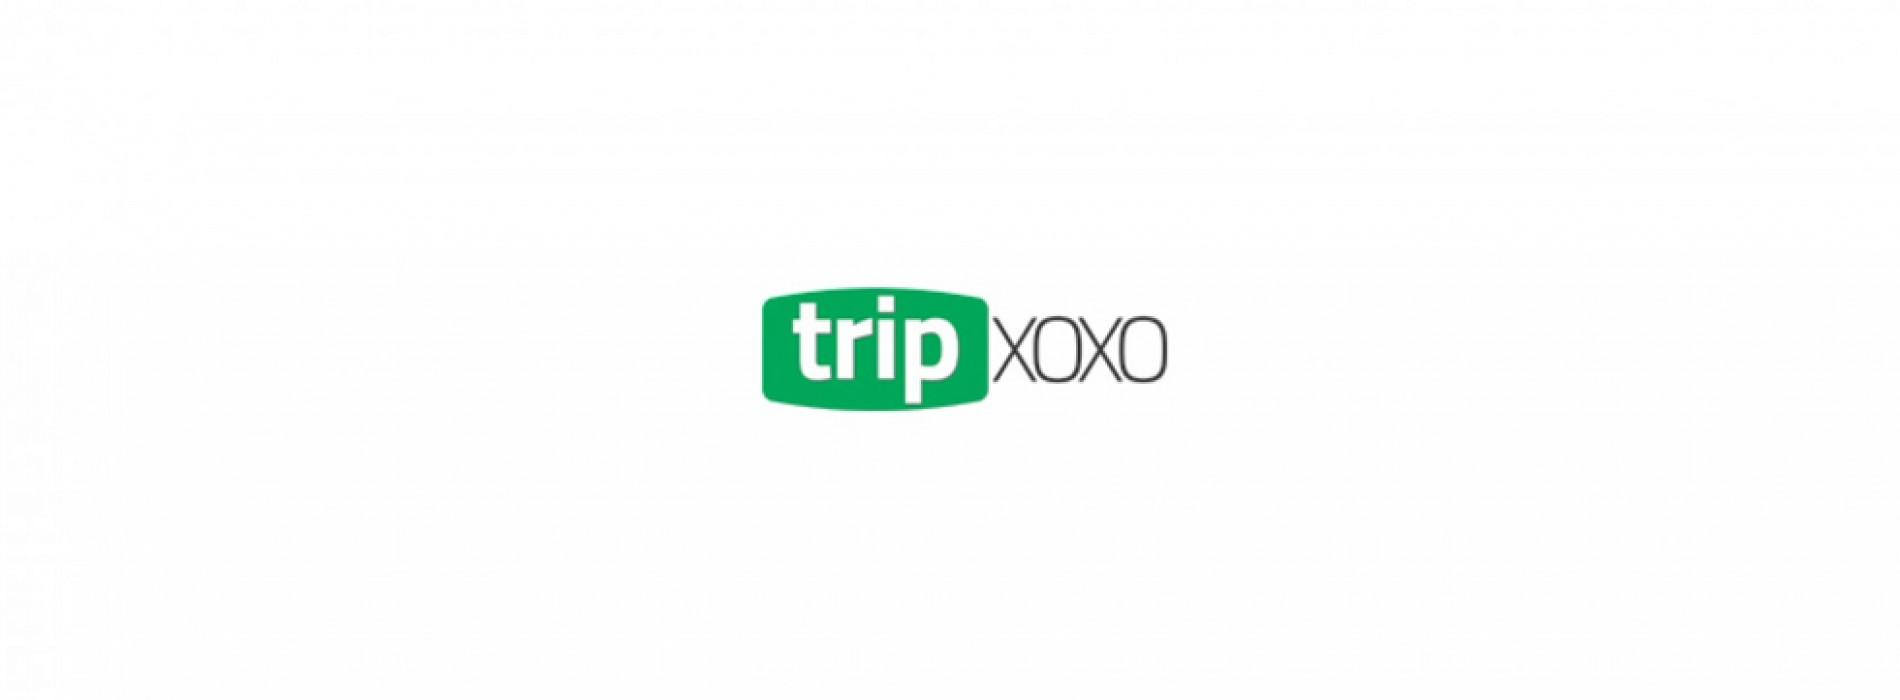 On India's 67th Republic Day, TripXOXO introduces 'Republic Day Plan'